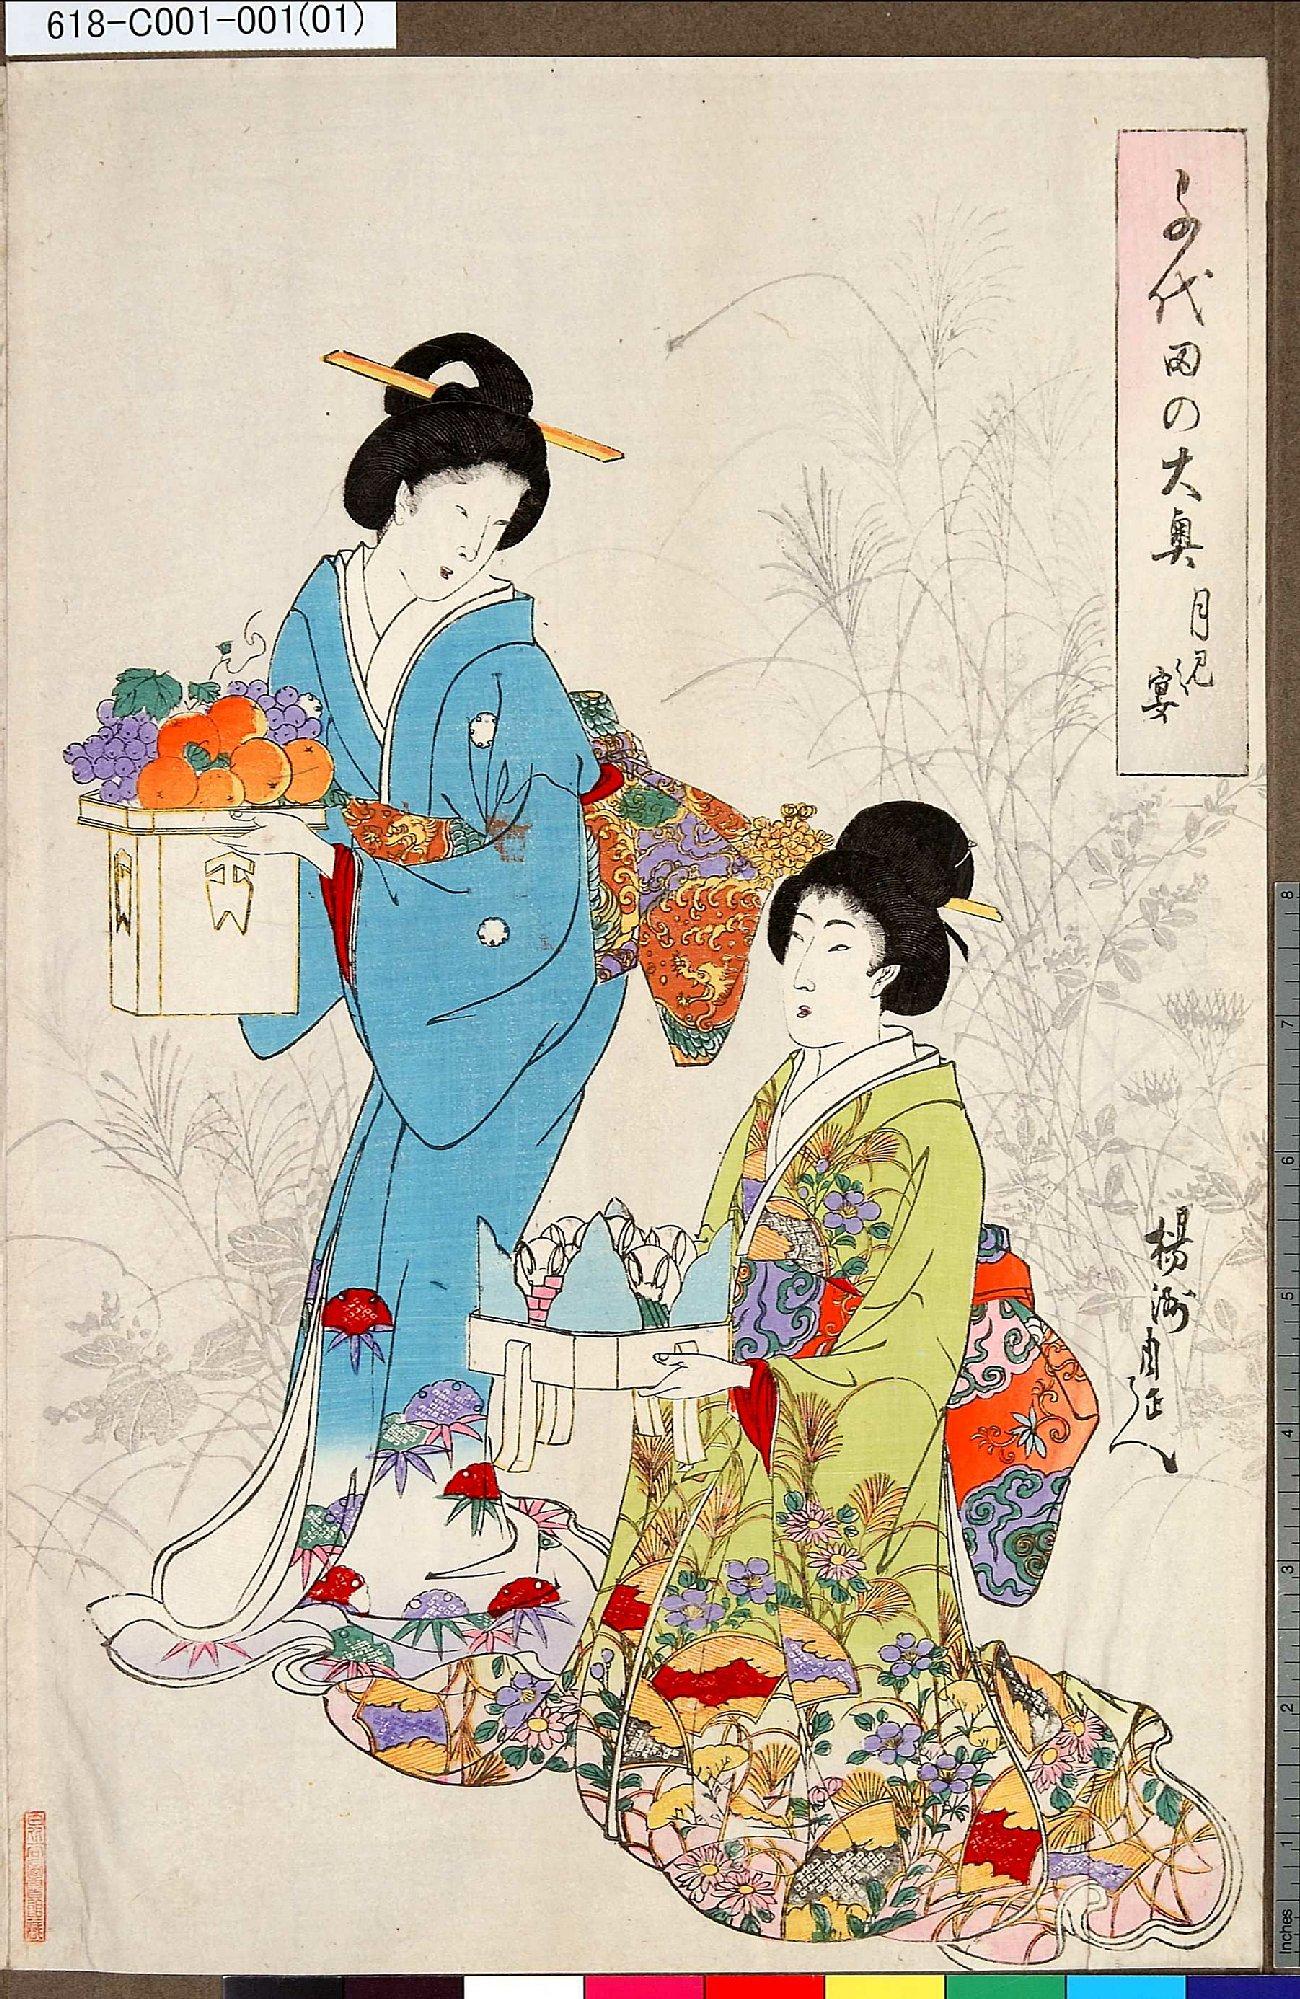 JAPANESE TRADITIONは百花繚乱!着物の柄に詳しくなりましょう!のサムネイル画像